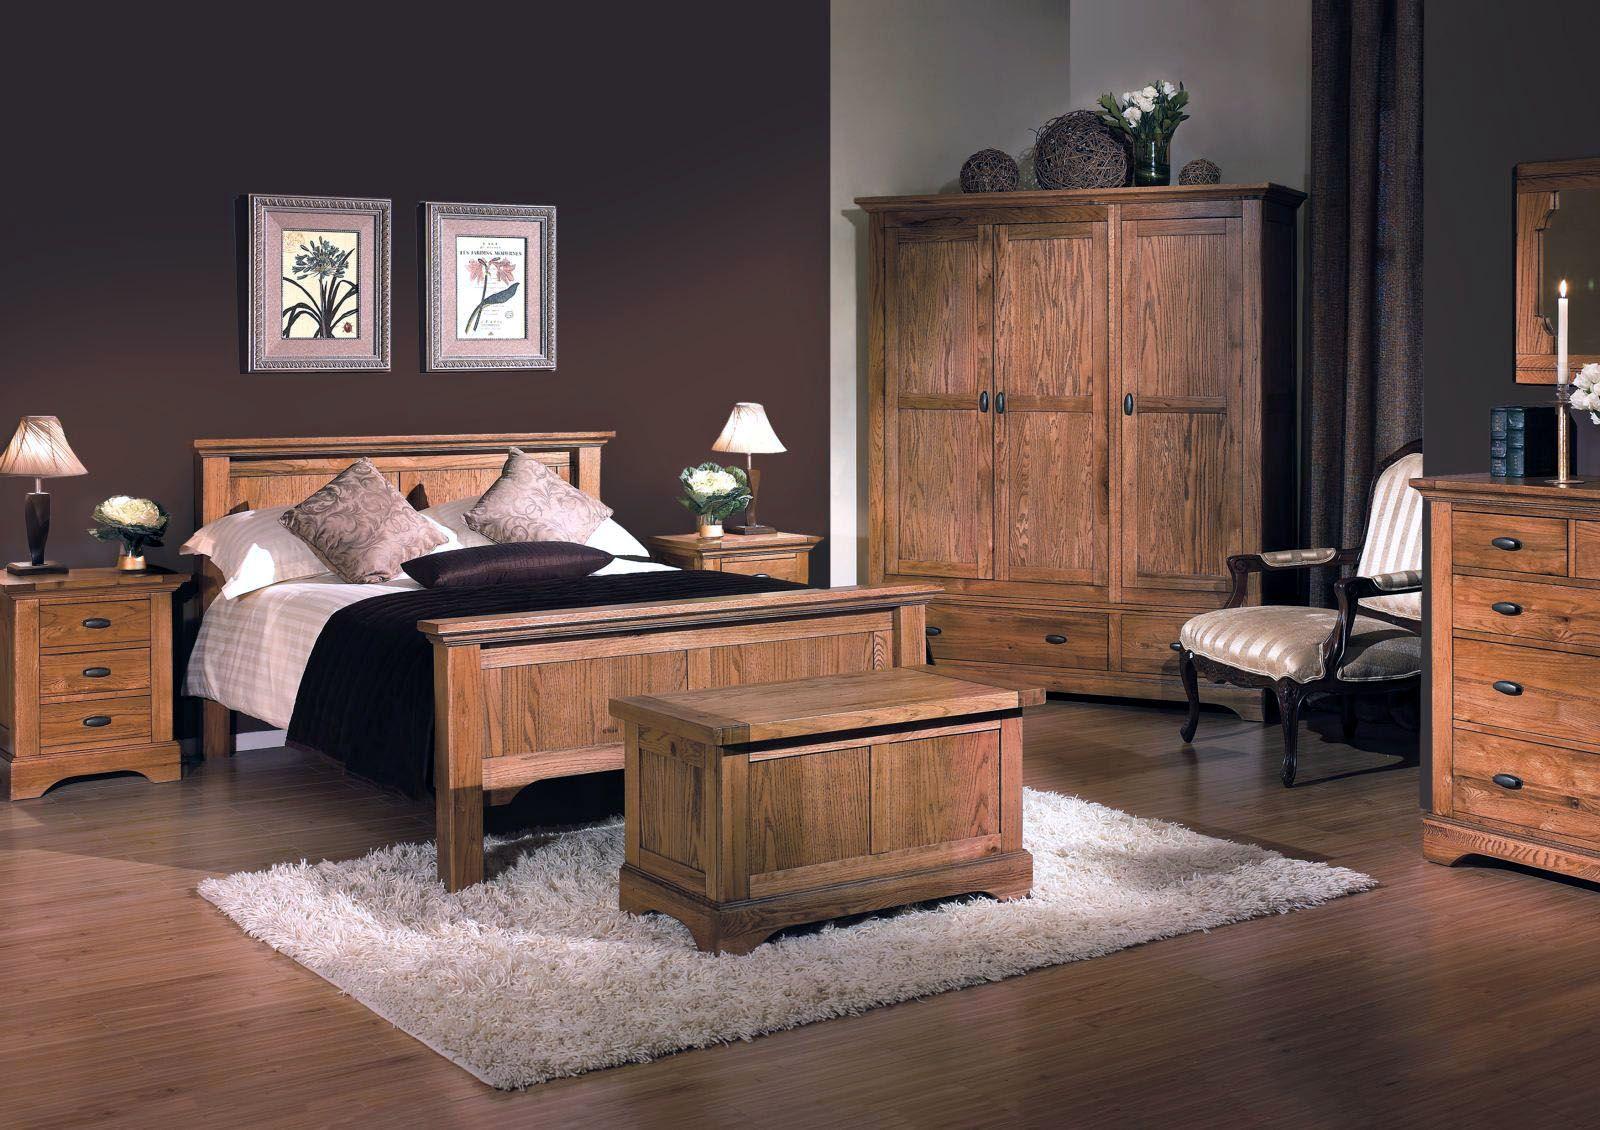 Master Bedroom Decorating Ideas Oak Bedroom Furniture Wooden